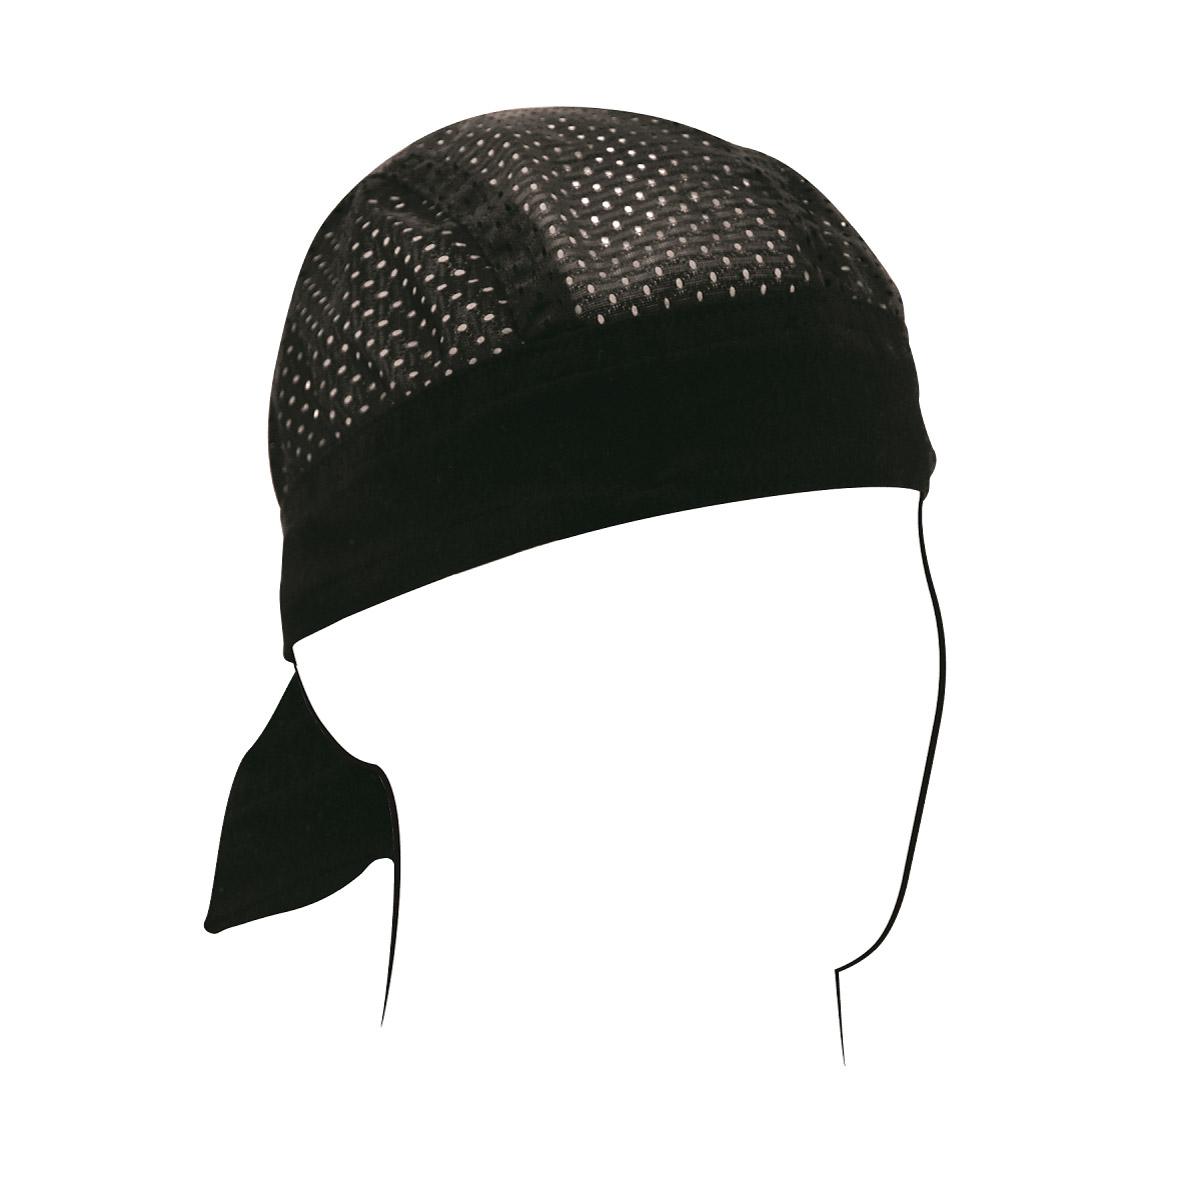 ZAN headgear Black Vented Sport Flydanna Headwrap